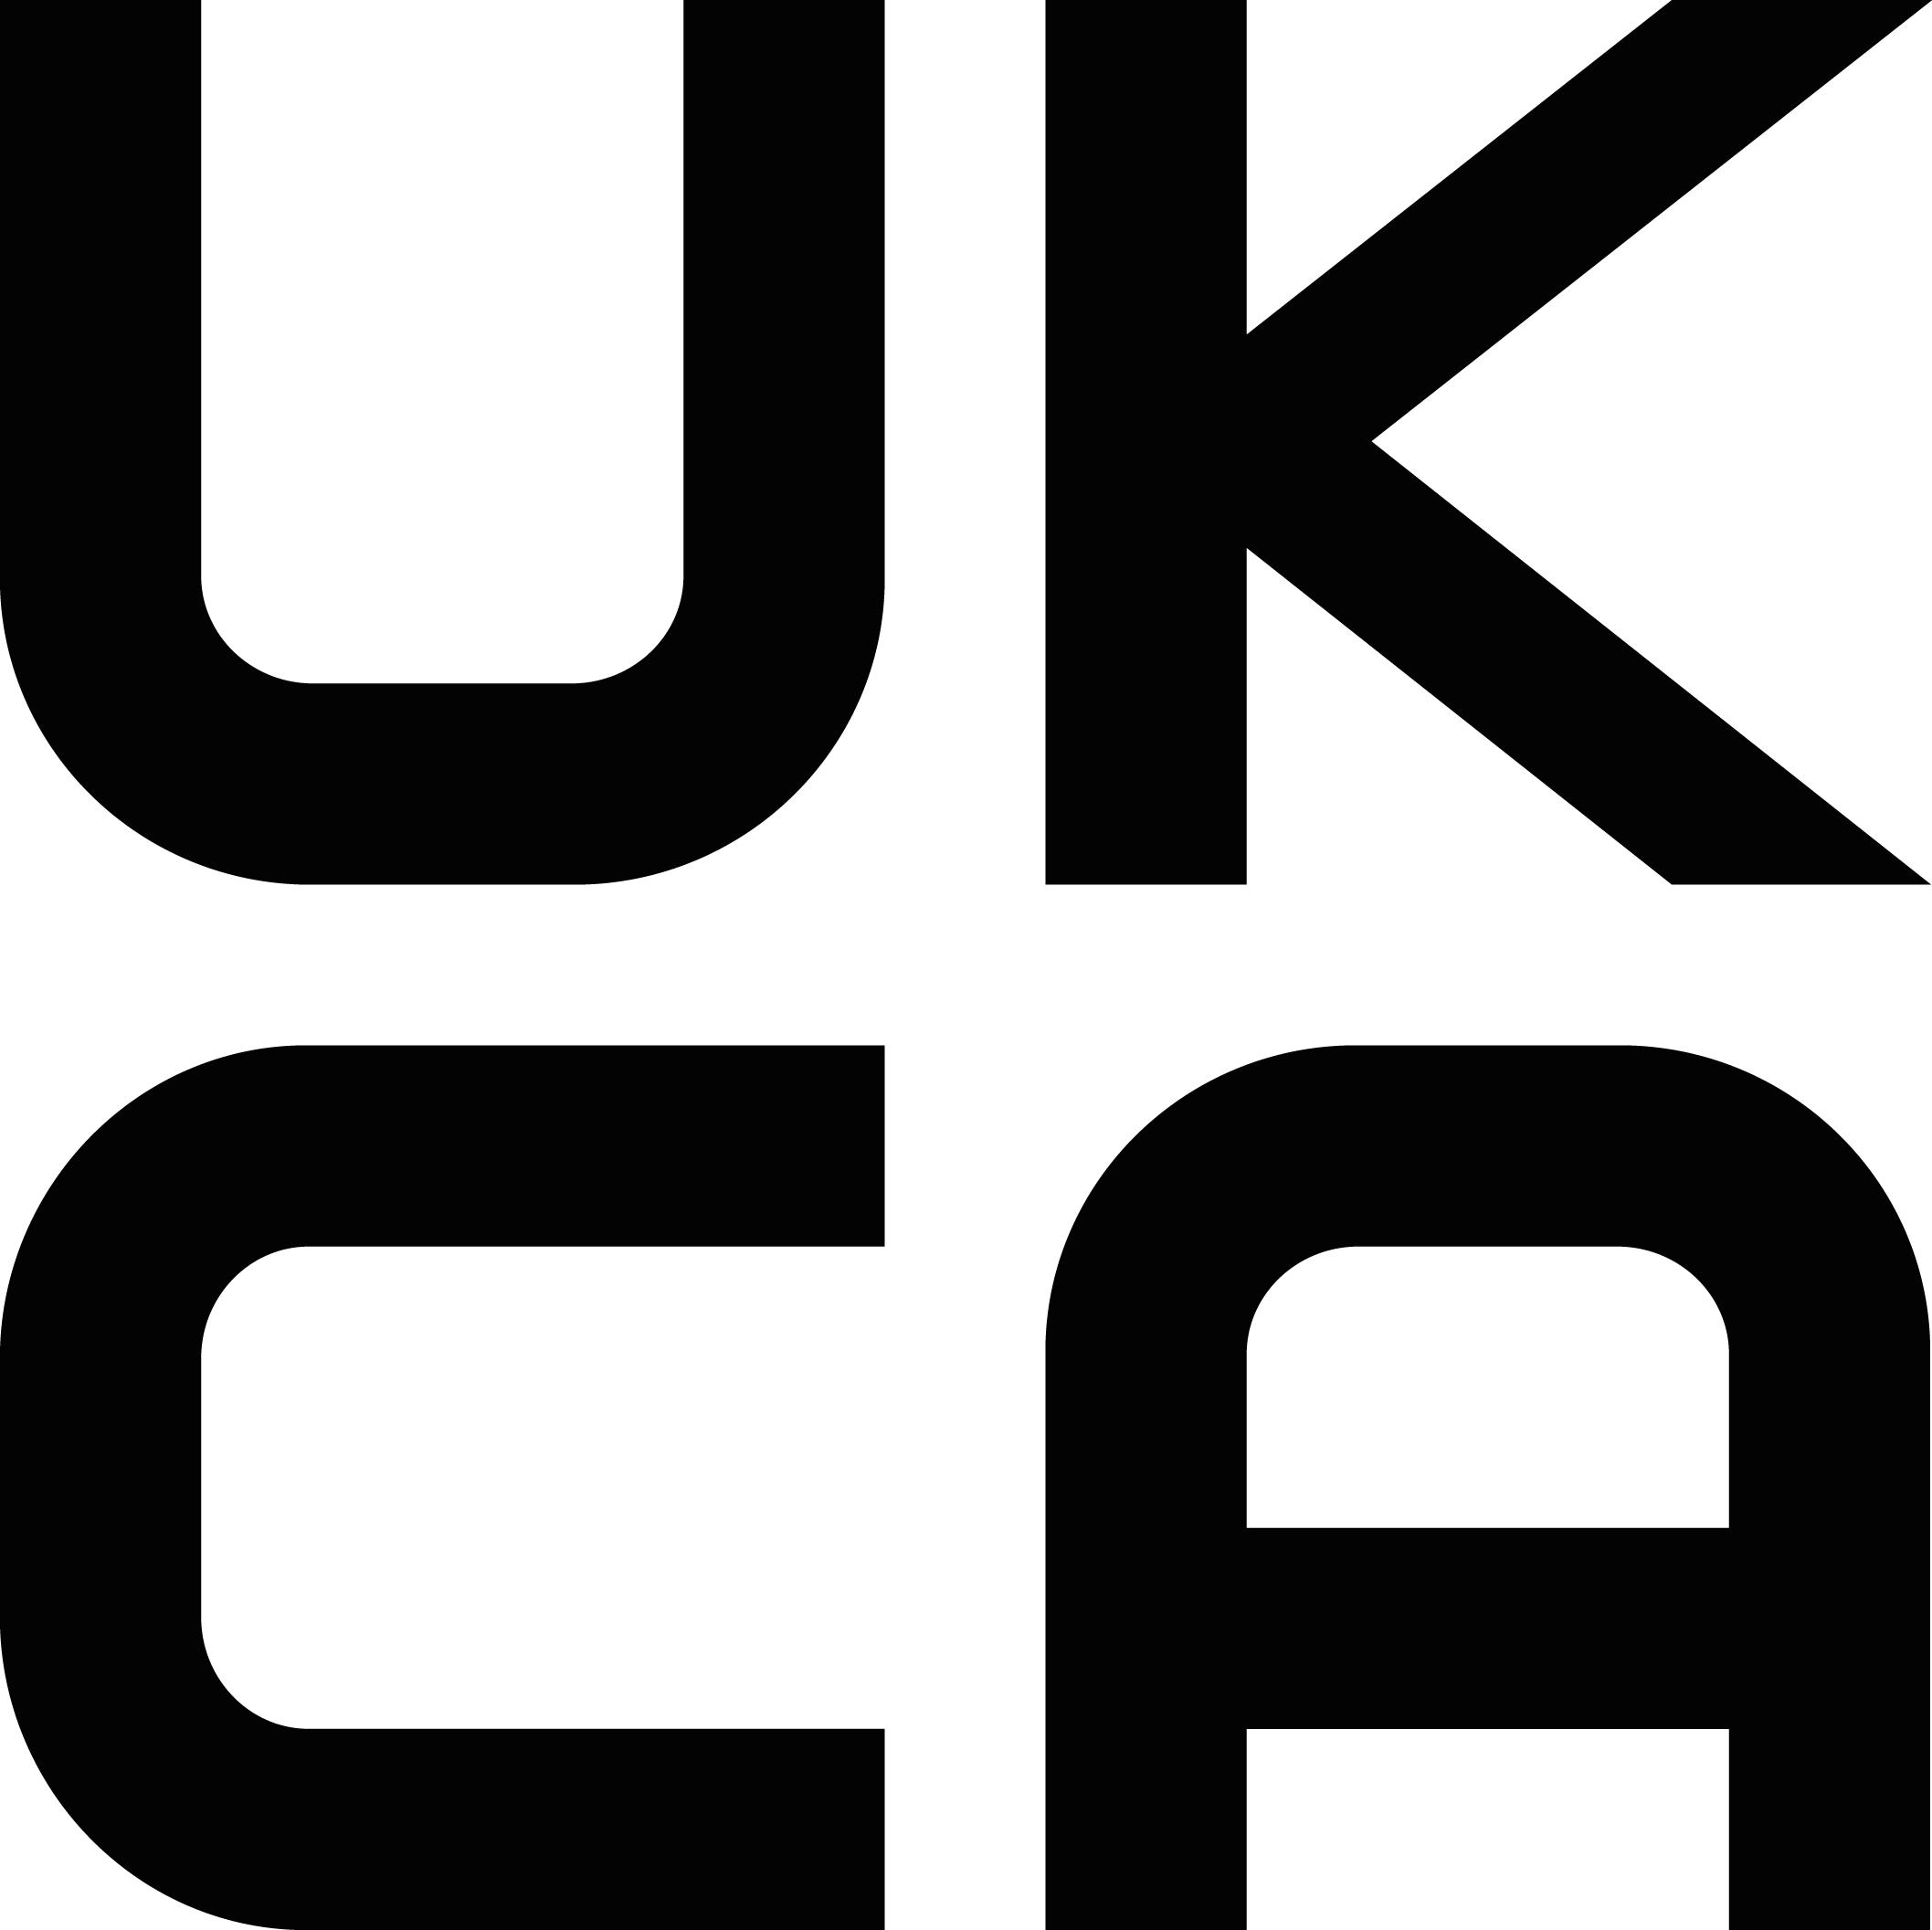 UK CA replaces CE